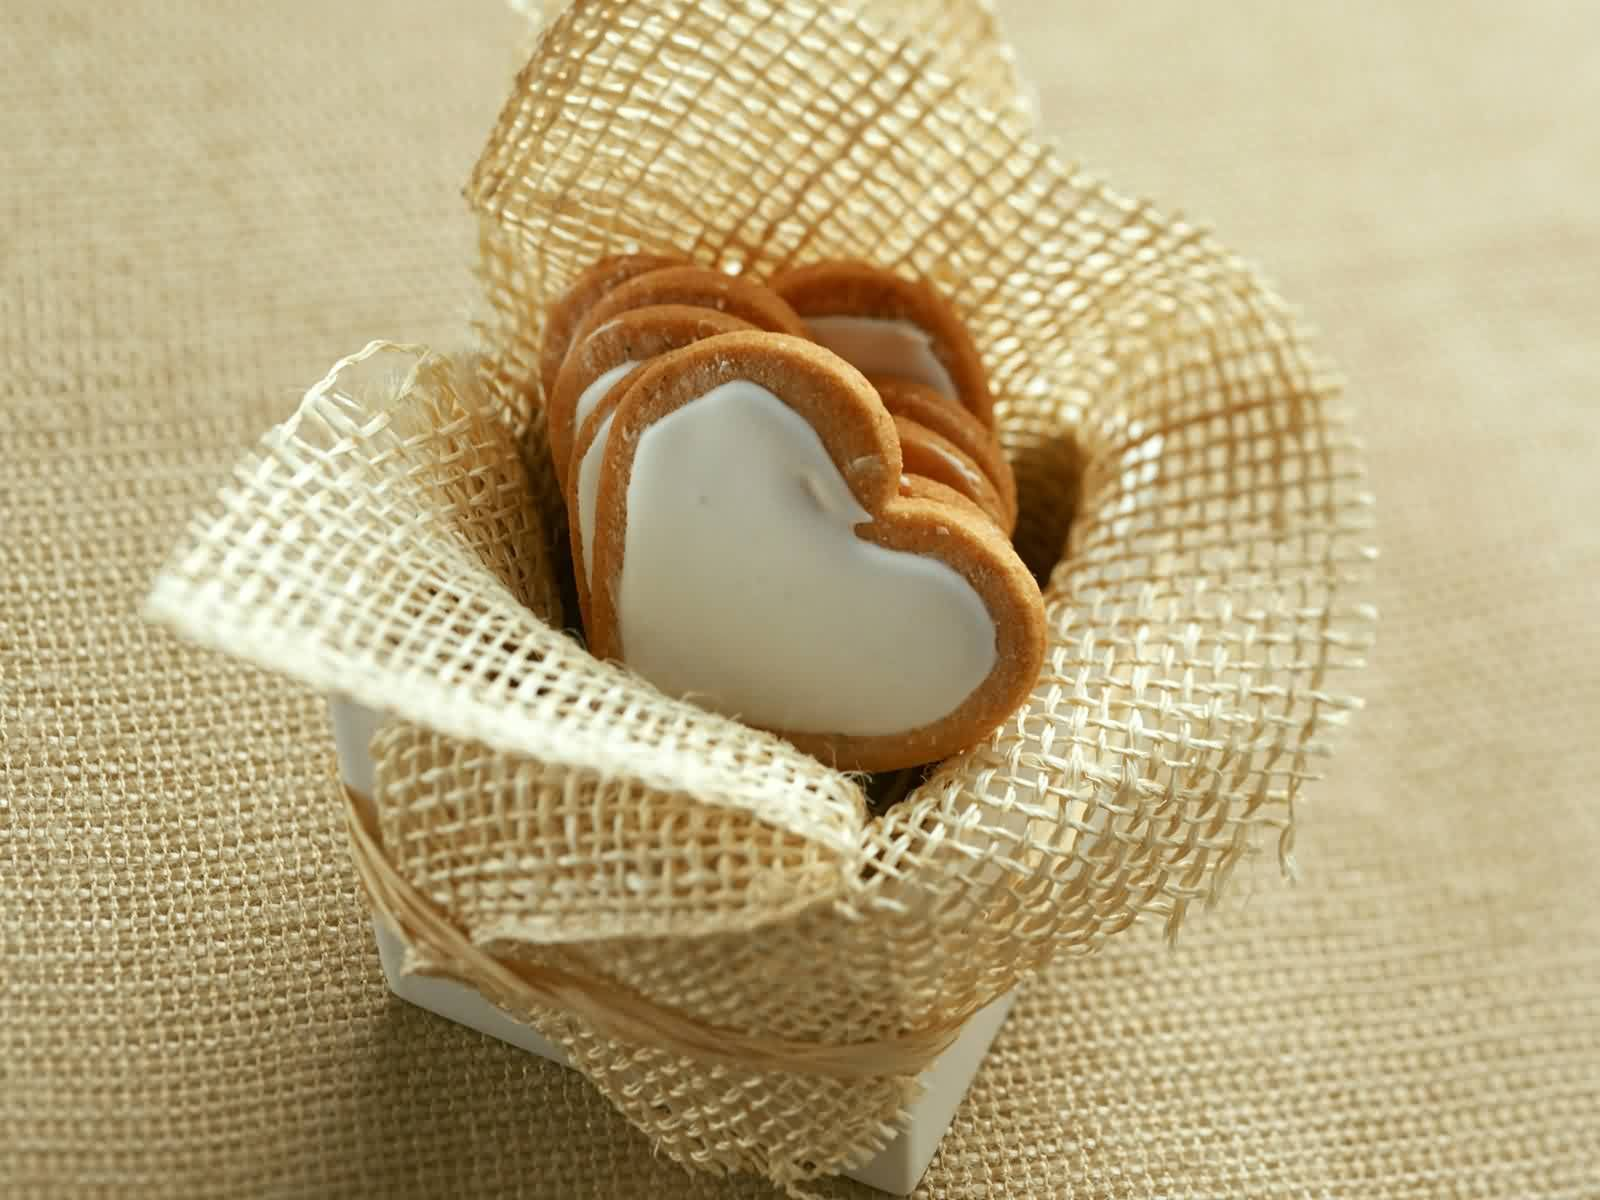 Chocolate In Heart Shape